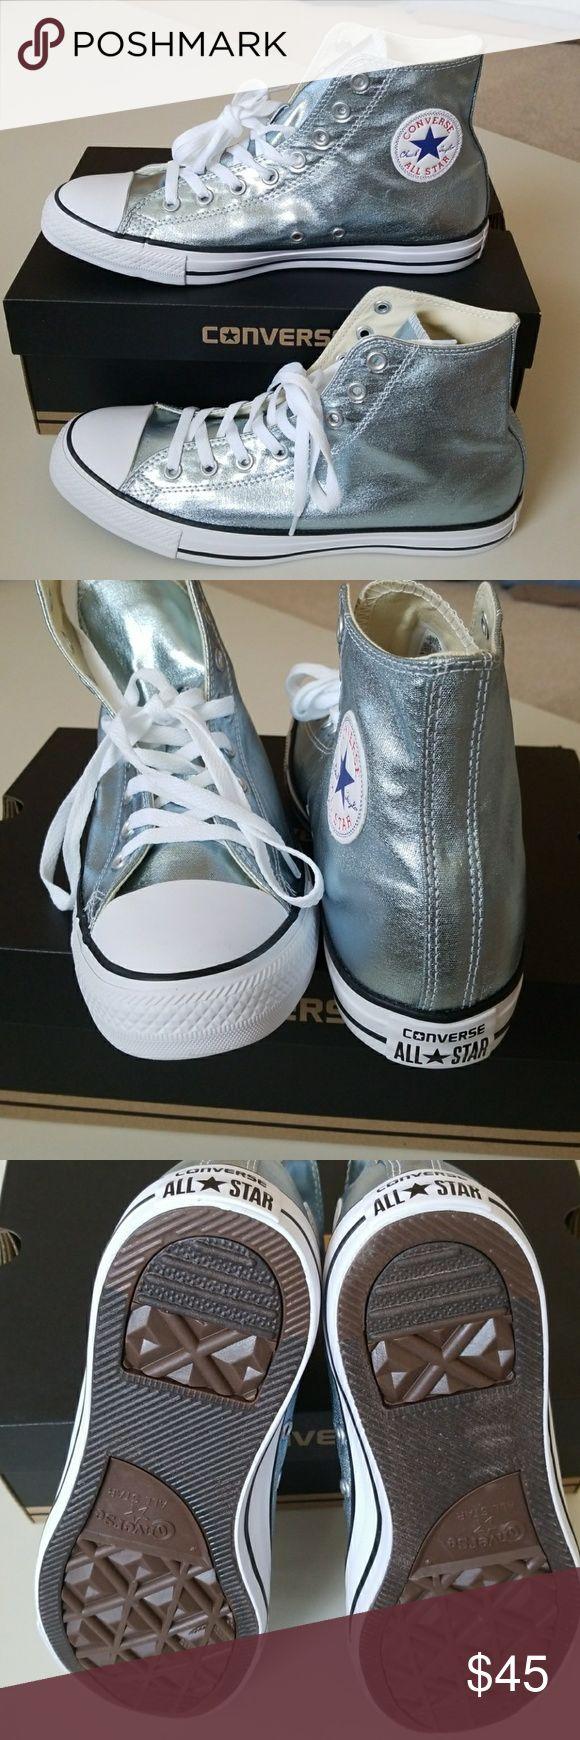 NWT Converse Unisex Super Cool Sneakers New Converse. Unisex.  Metallic light blueish gray color. Super duper cool high tops for those with a little bit of spunk!   Men=7 Women=9 Men=8 Women=10 Men=9 Women=11 Men=10 Women =12 Converse Shoes Sneakers